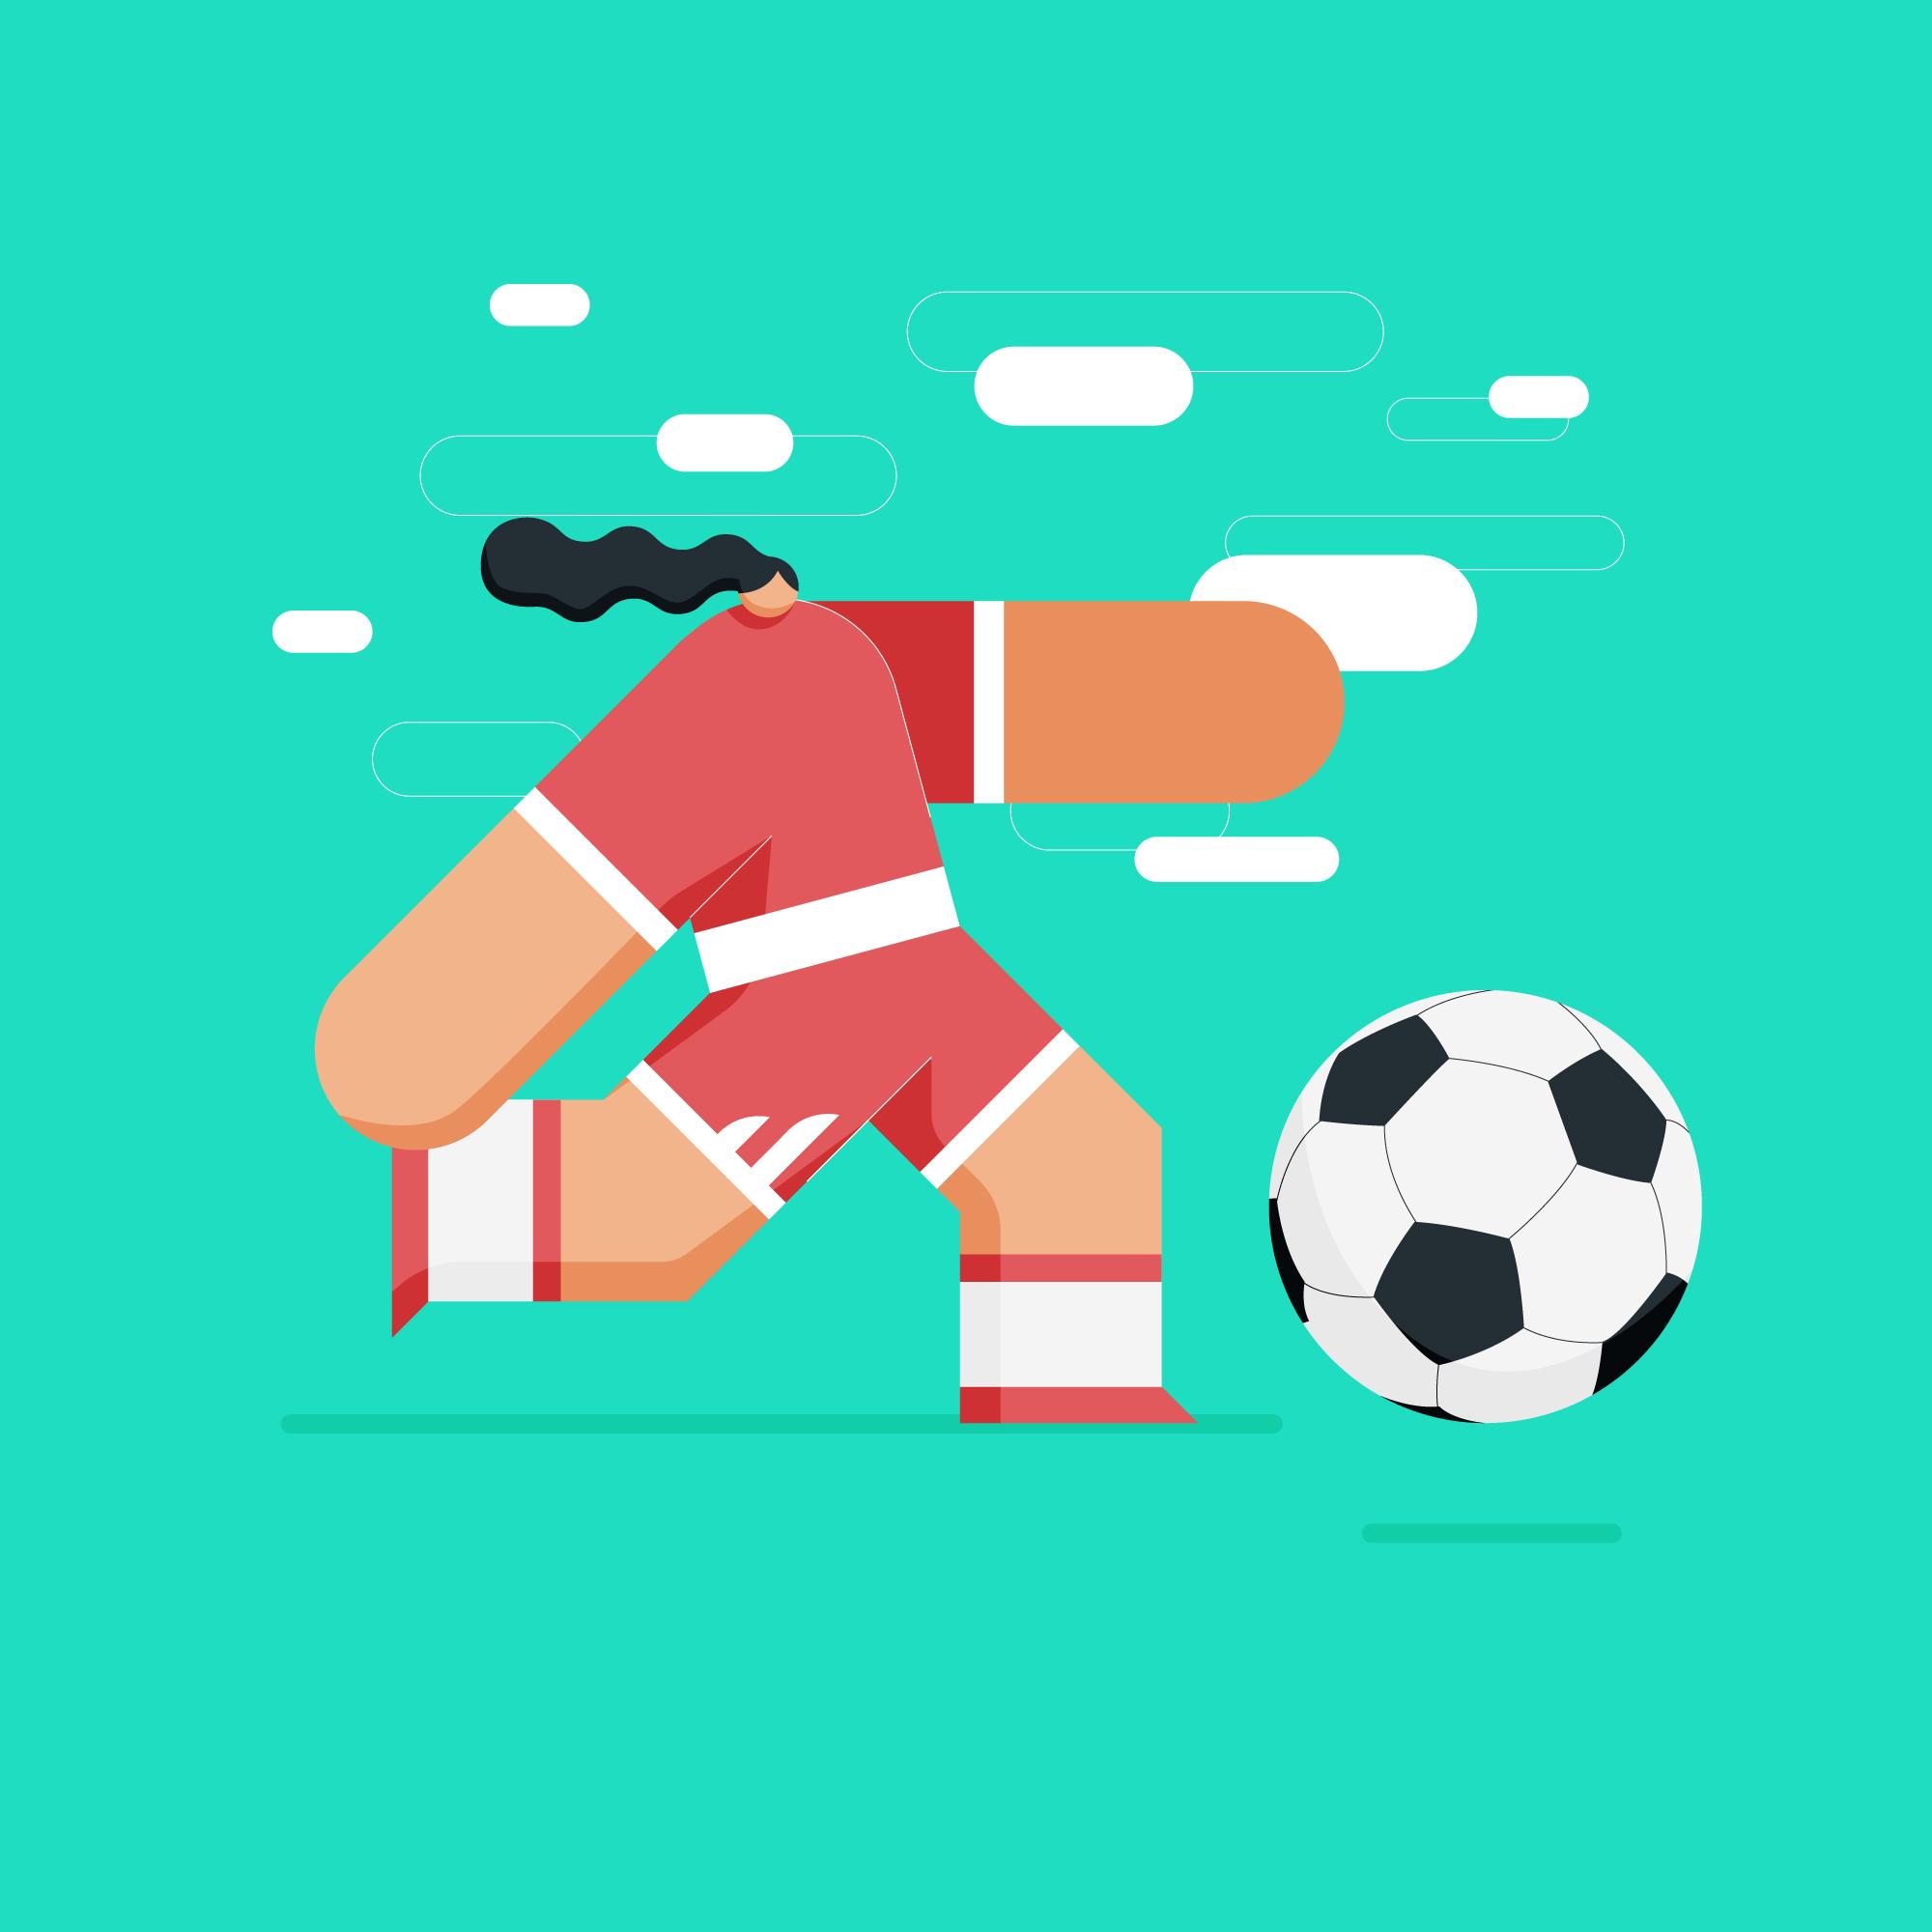 BigBuds_Soccer_Insta.jpg